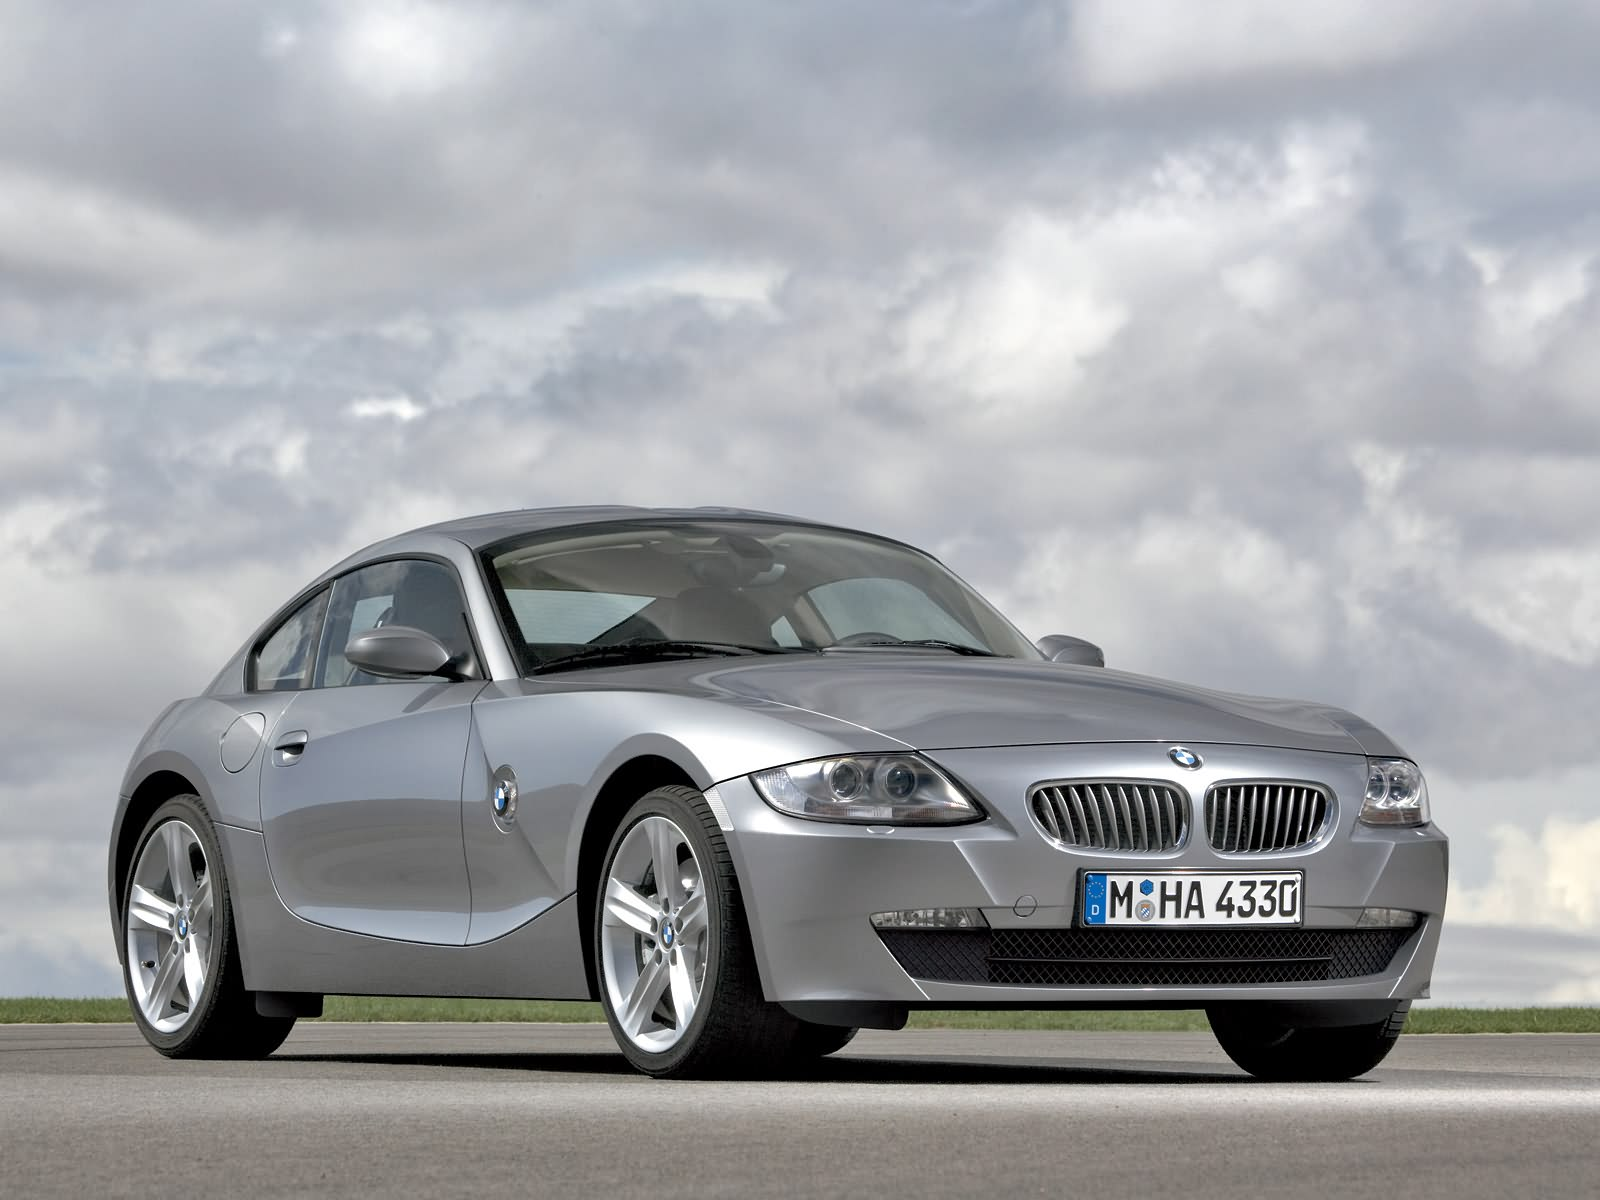 Car Automobile World: BMW Cars